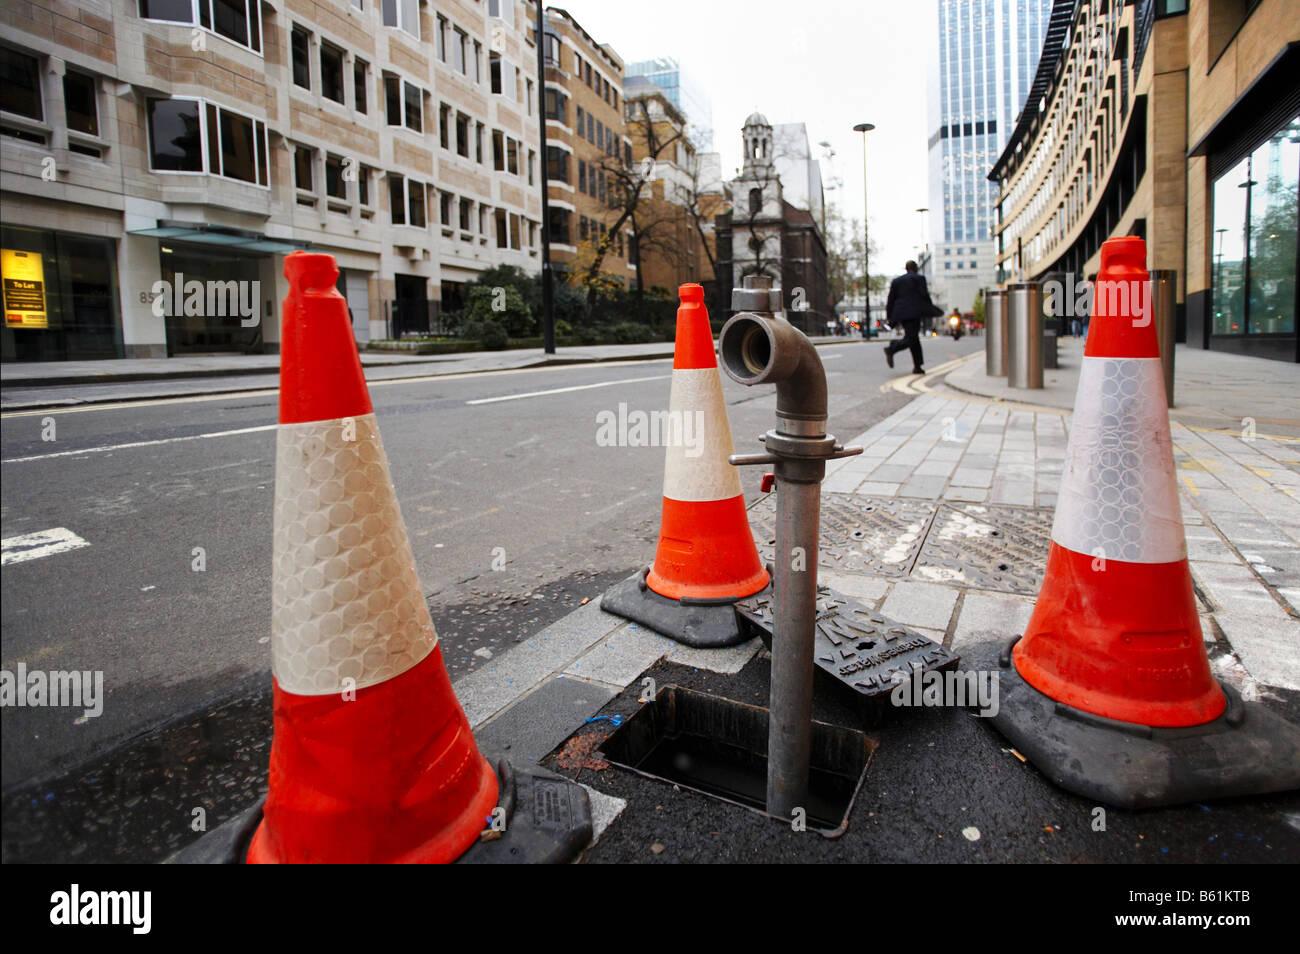 utility works in London UK - Stock Image